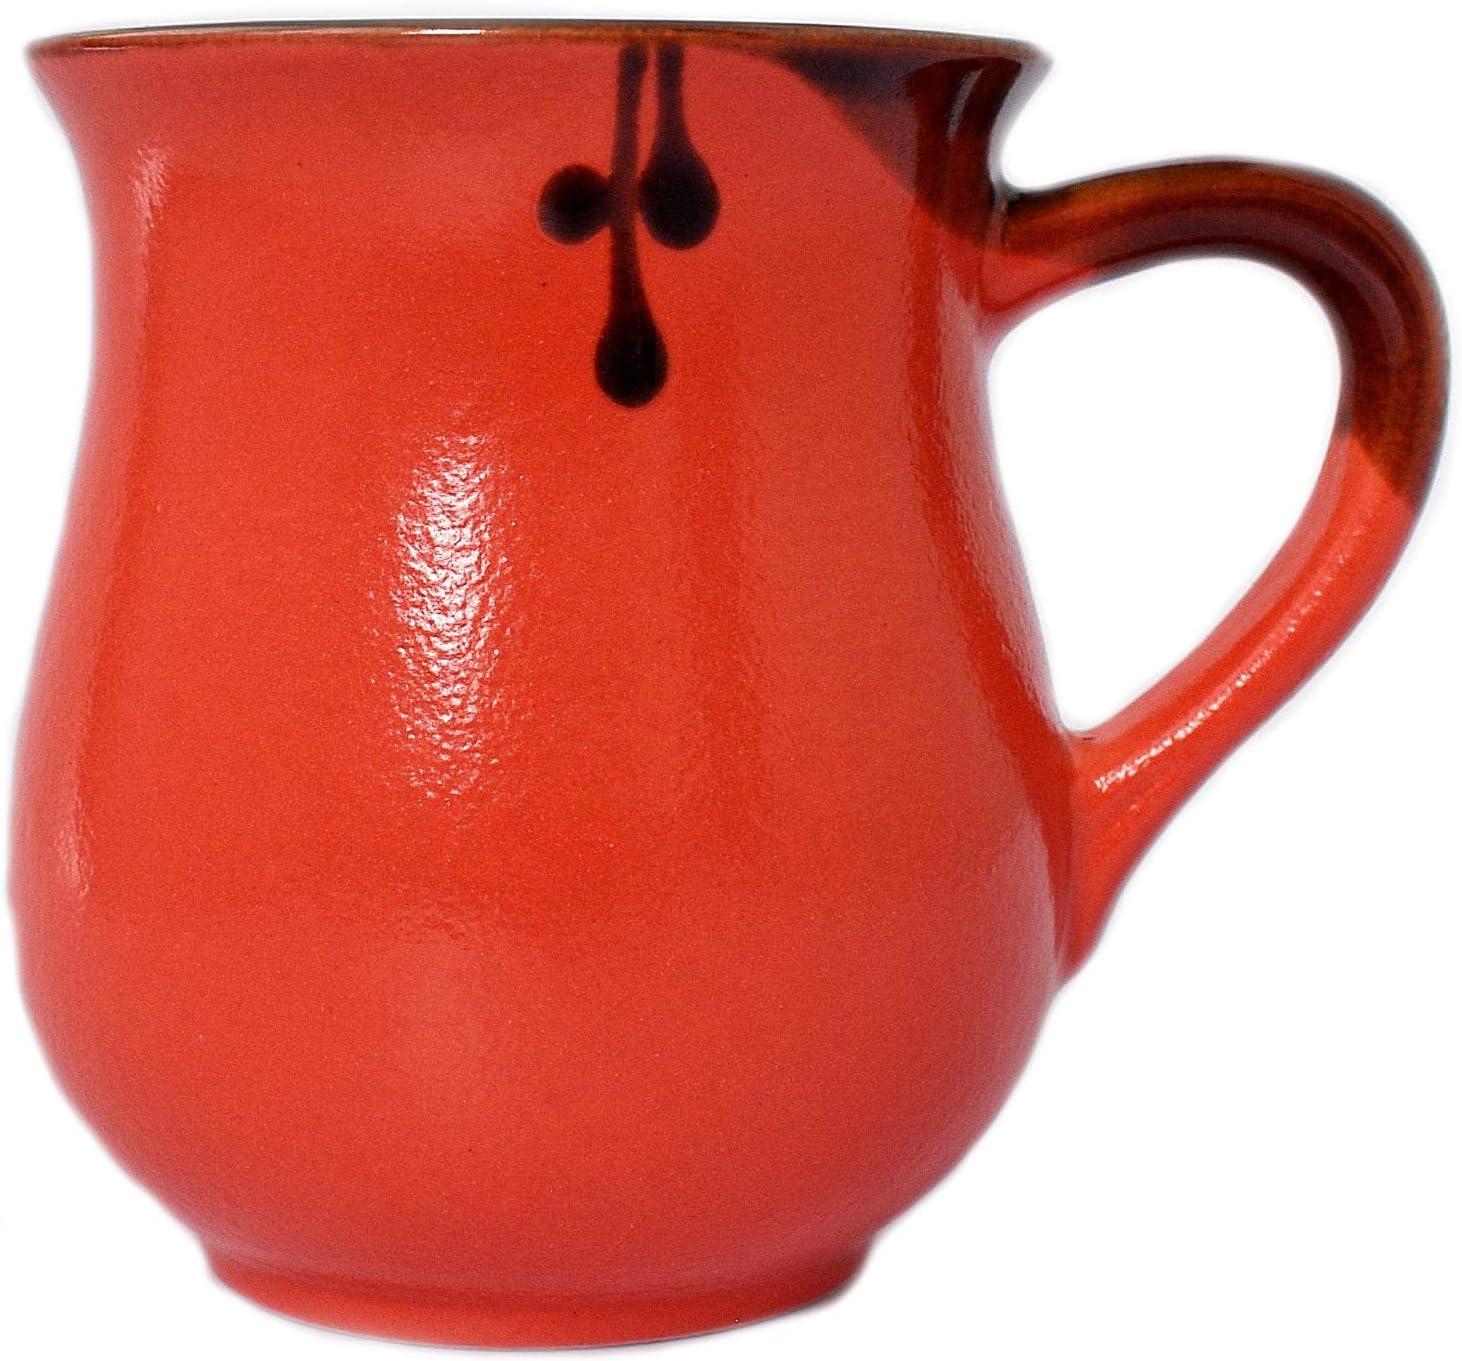 Pottery coffee mug «Standart Red» 10 oz